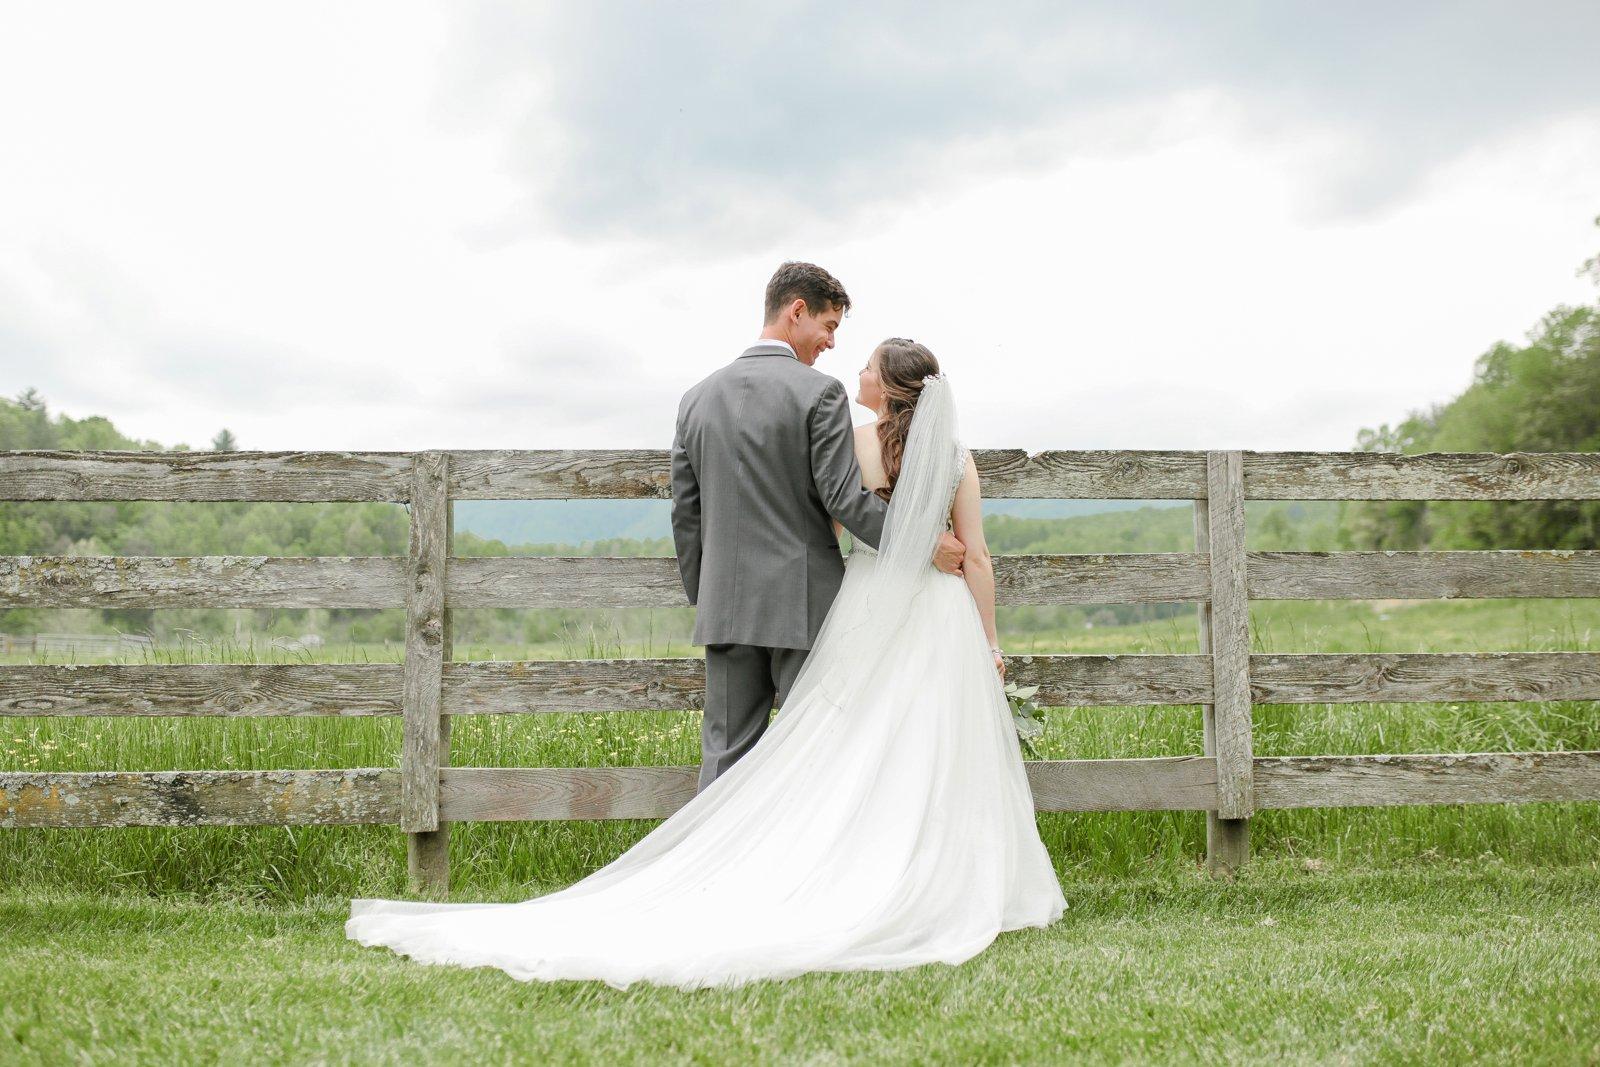 wedding_photographer_Missouri_Destination_elope_intimate_Saint_James_MO_Missouri_KansasCity_Jeff_City_Jefferson_Columbia_Engagement_Photos_Pictures_Session_Best_Videographer_0196.jpg